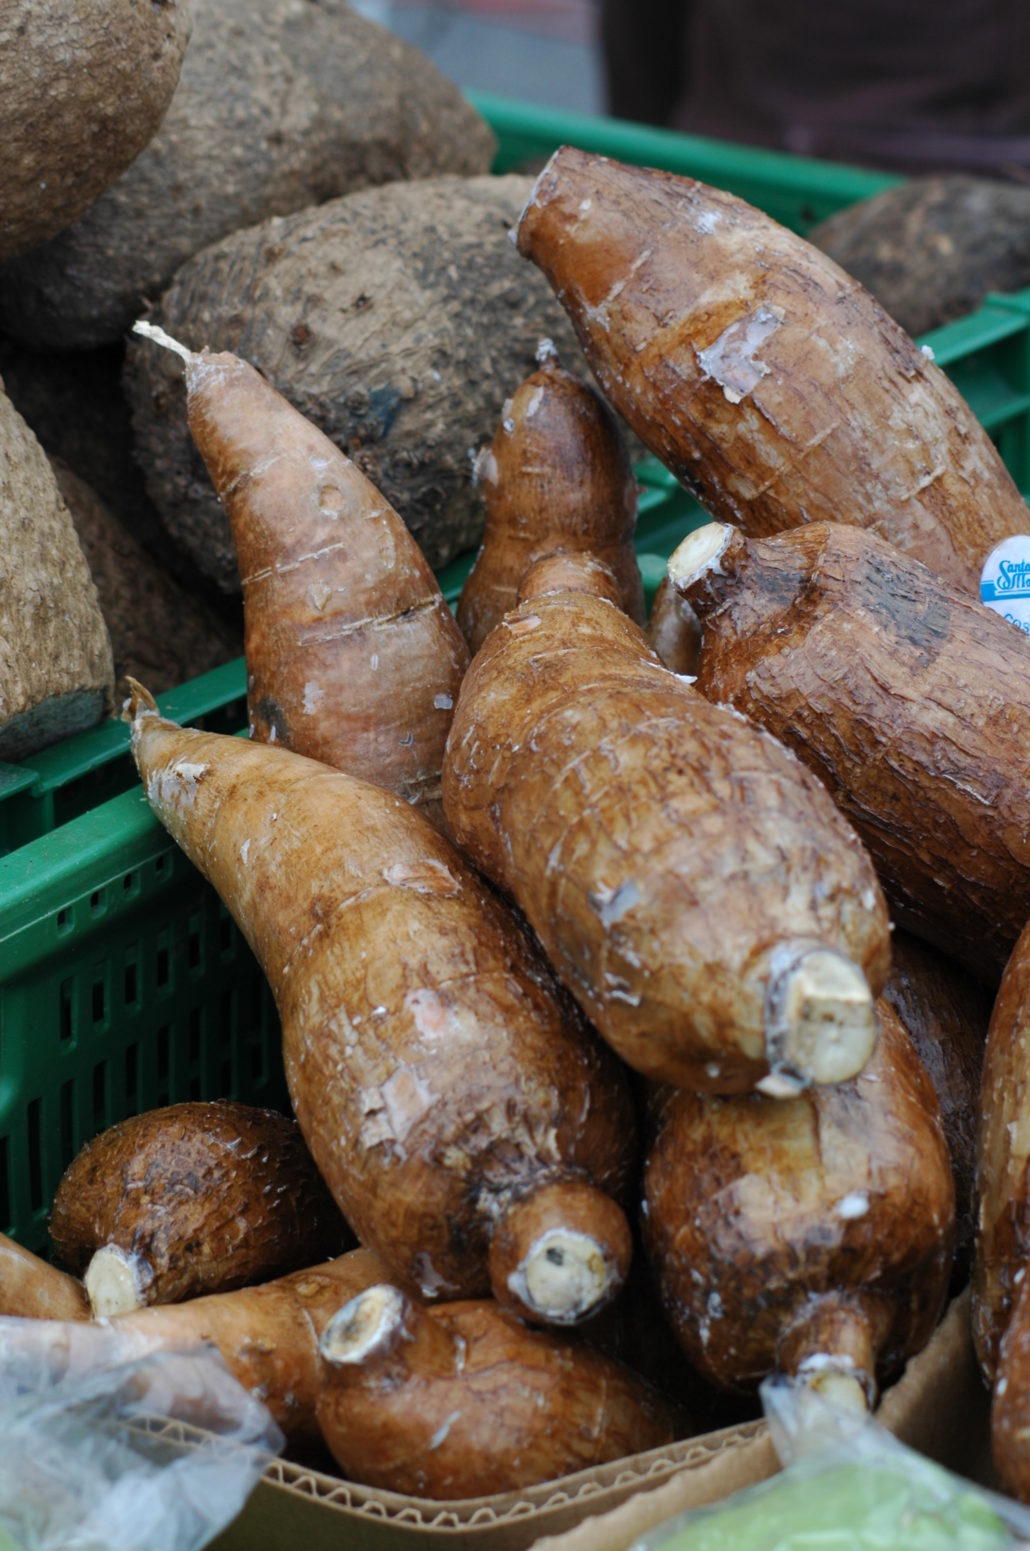 Manioc Root In Brazil